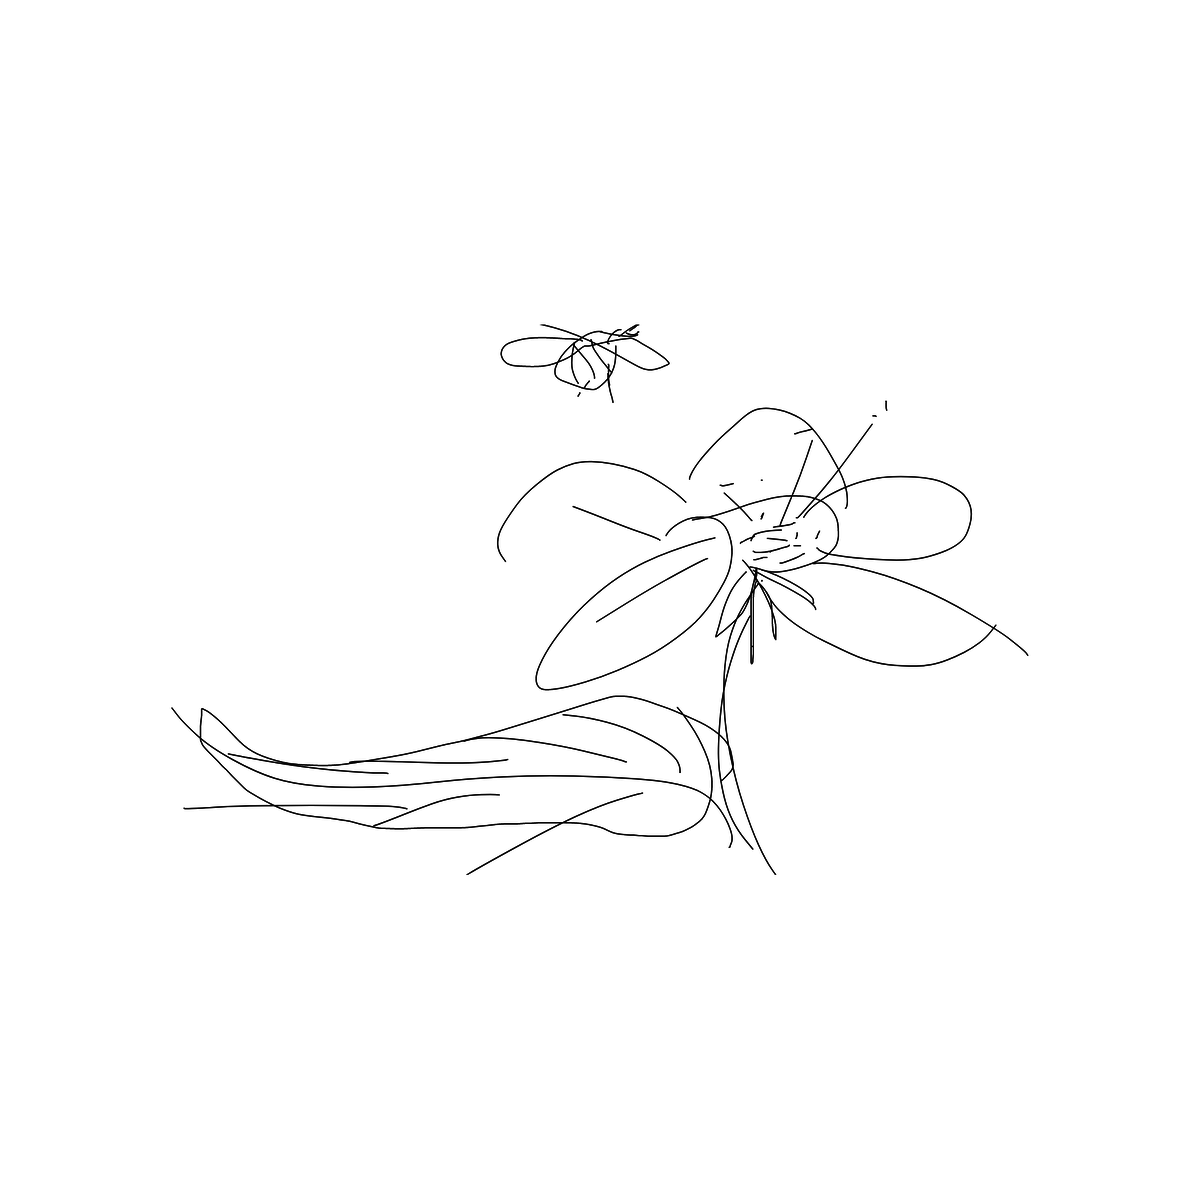 BAAAM drawing#24221 lat:50.0953025817871100lng: 14.7216567993164060